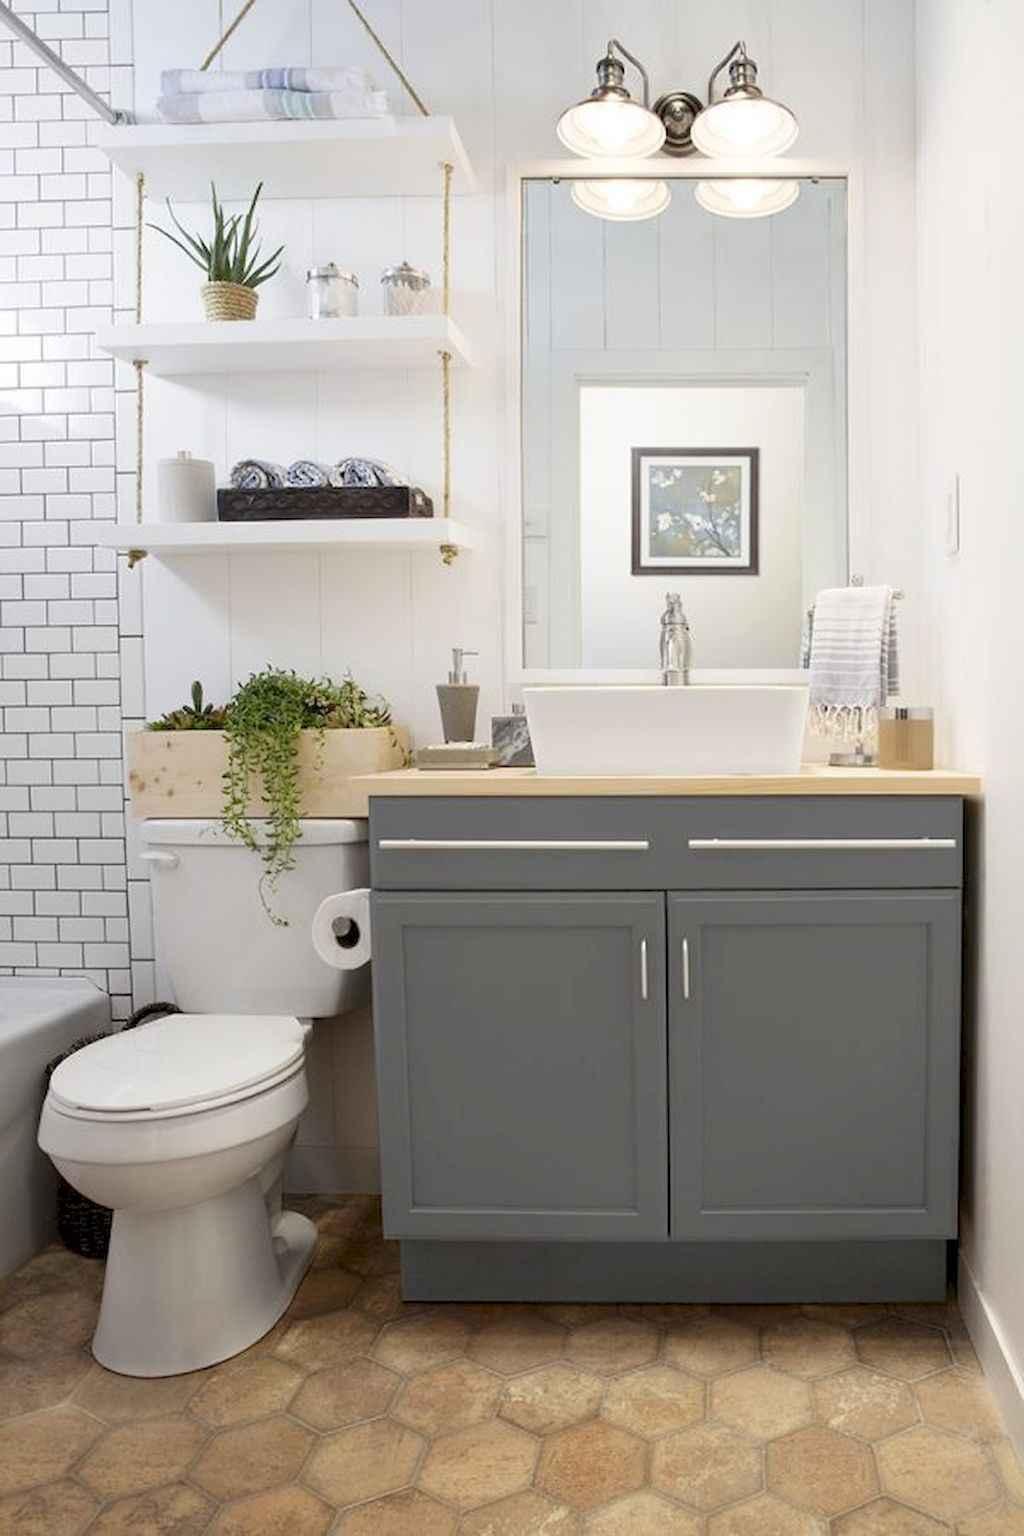 Cool bathroom storage shelves organization ideas (51)